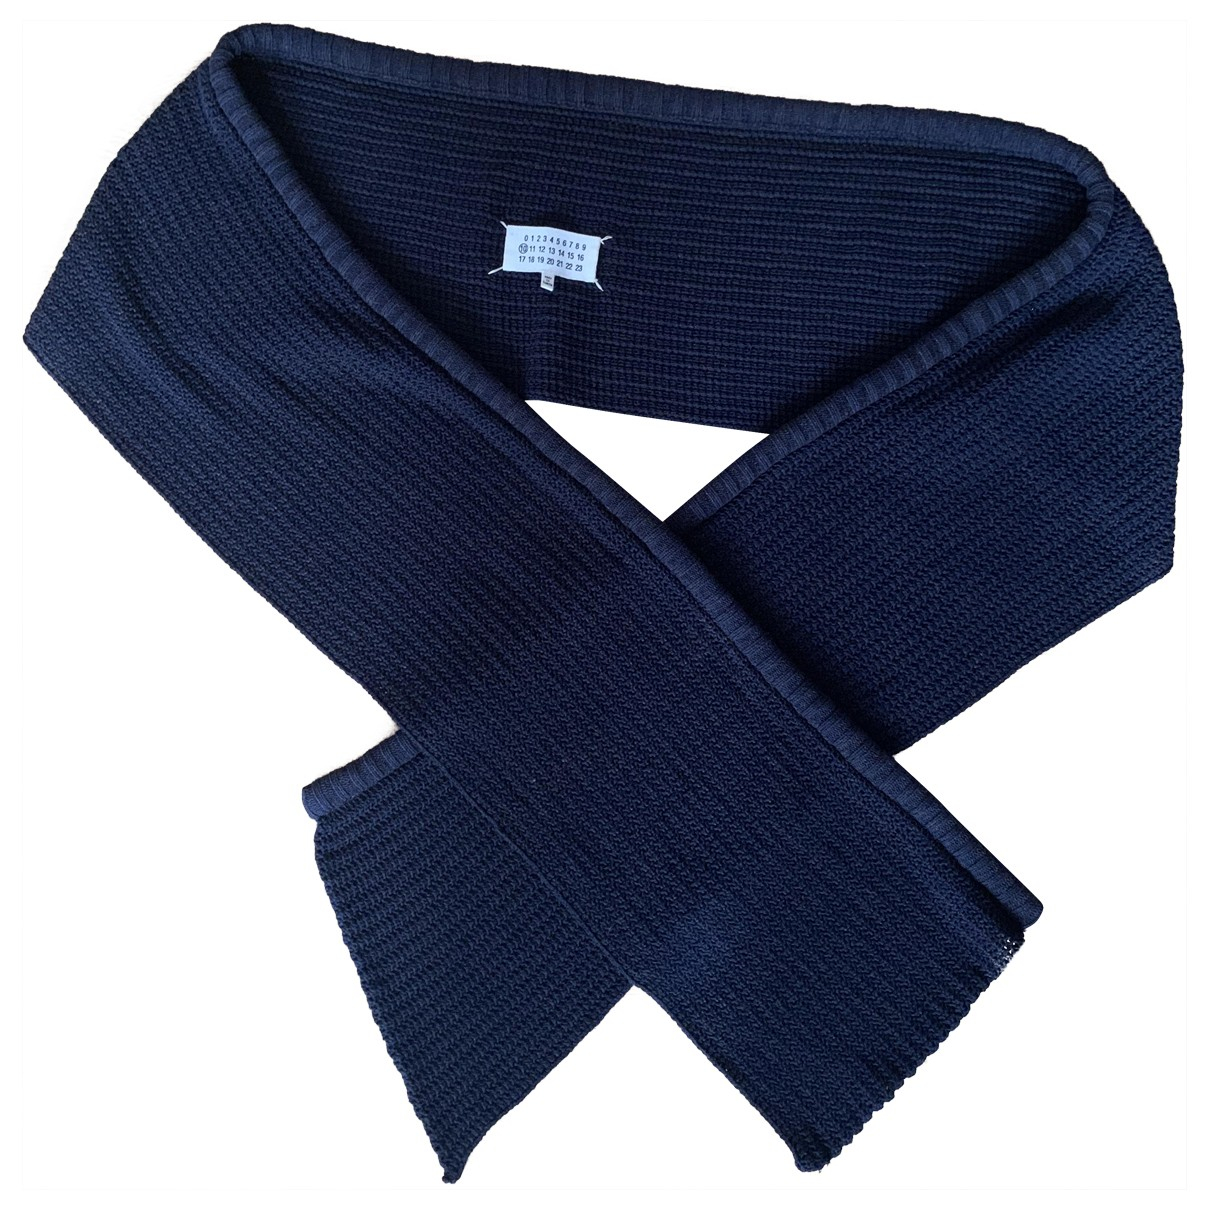 Maison Martin Margiela N Blue Wool scarf & pocket squares for Men N